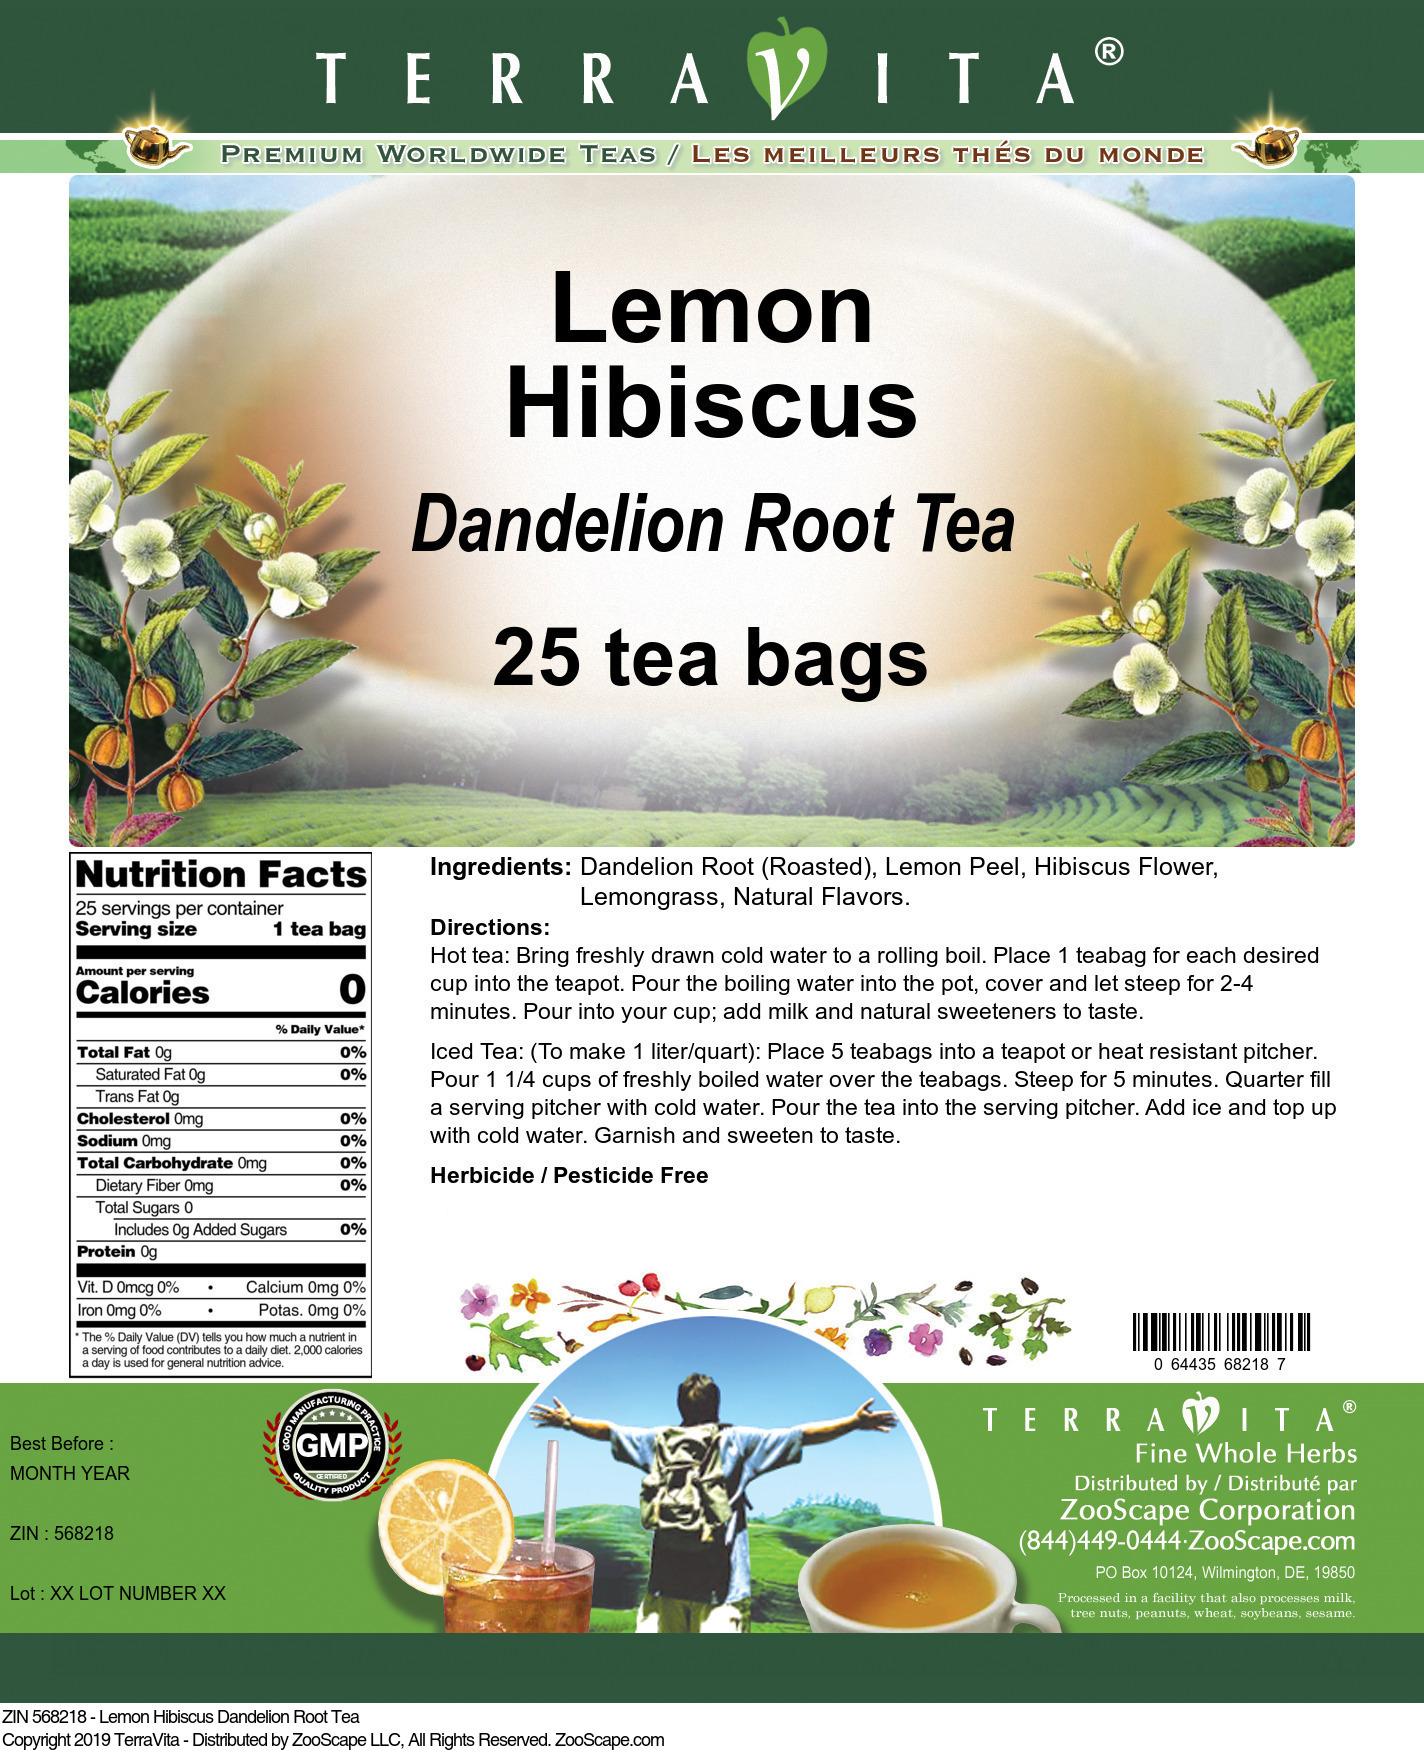 Lemon Hibiscus Dandelion Root Tea